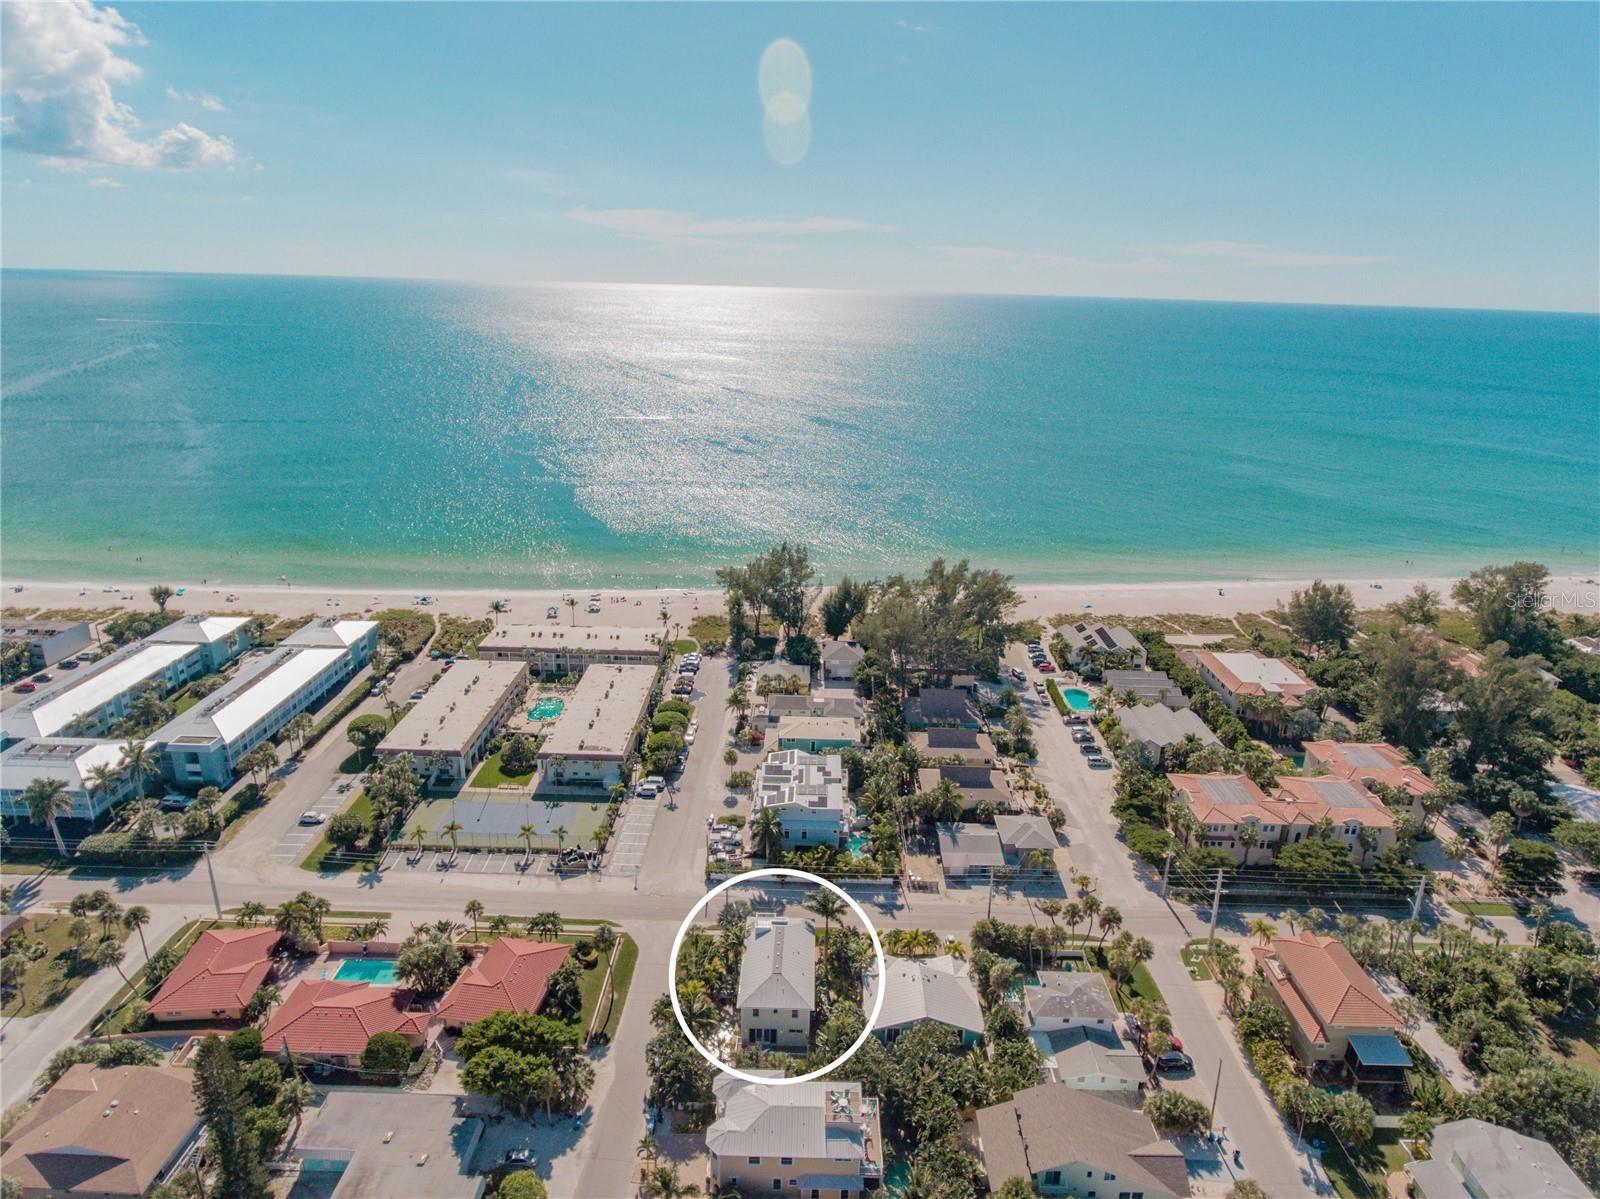 Photo of 7201 GULF DRIVE, HOLMES BEACH, FL 34217 (MLS # A4502030)